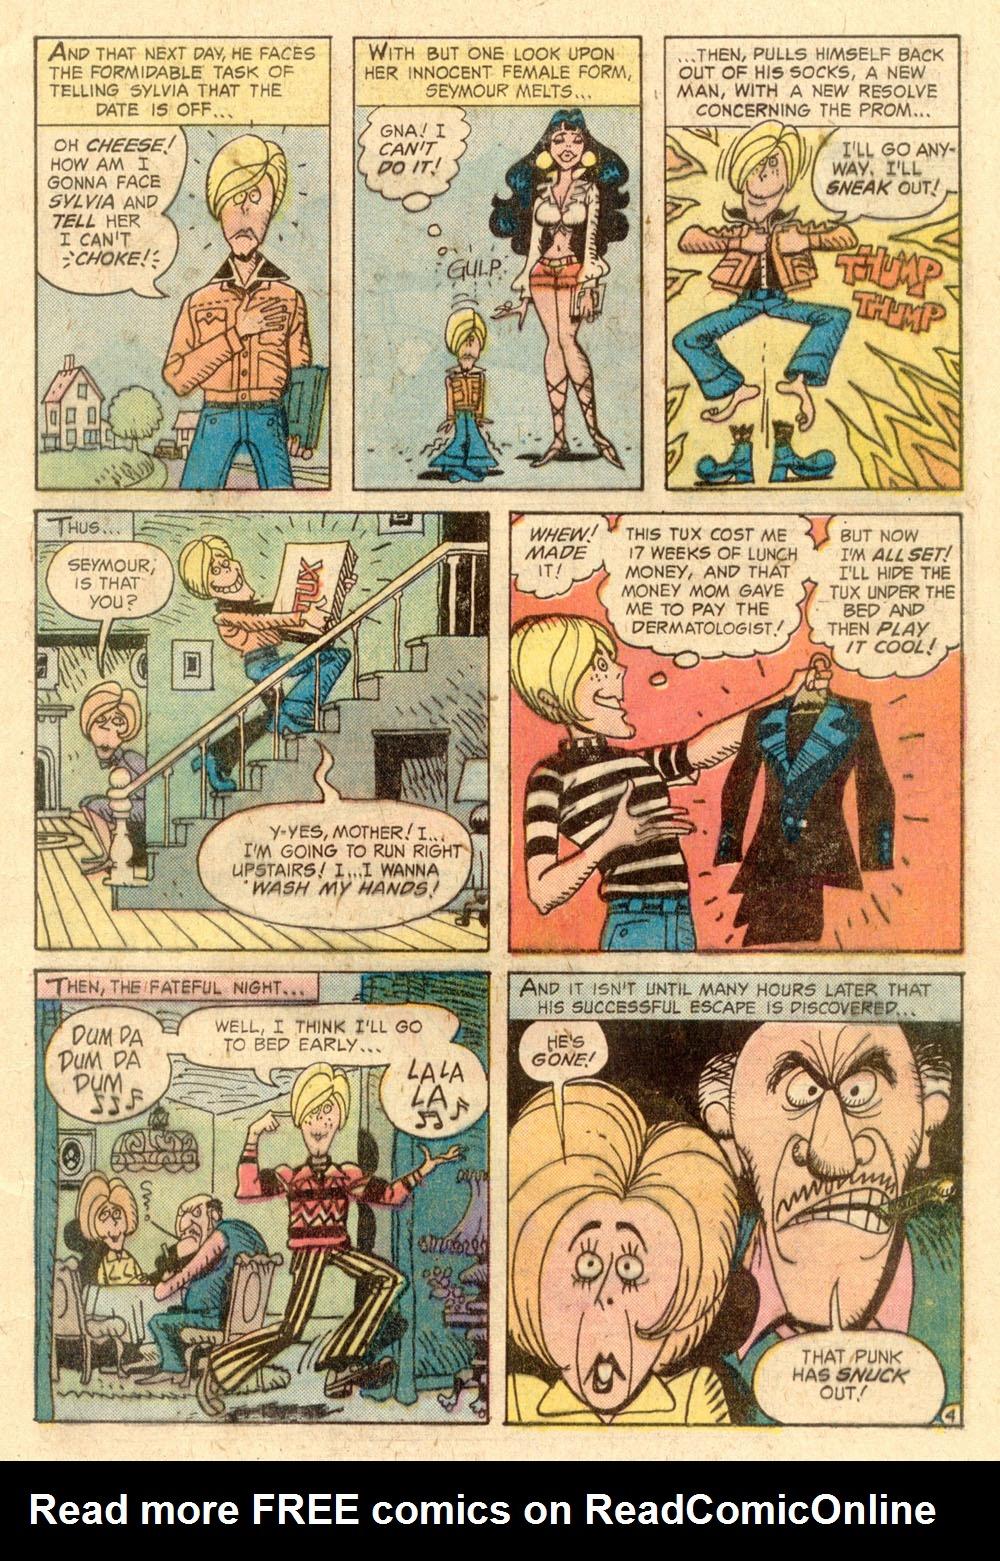 Read online Plop! comic -  Issue #16 - 12